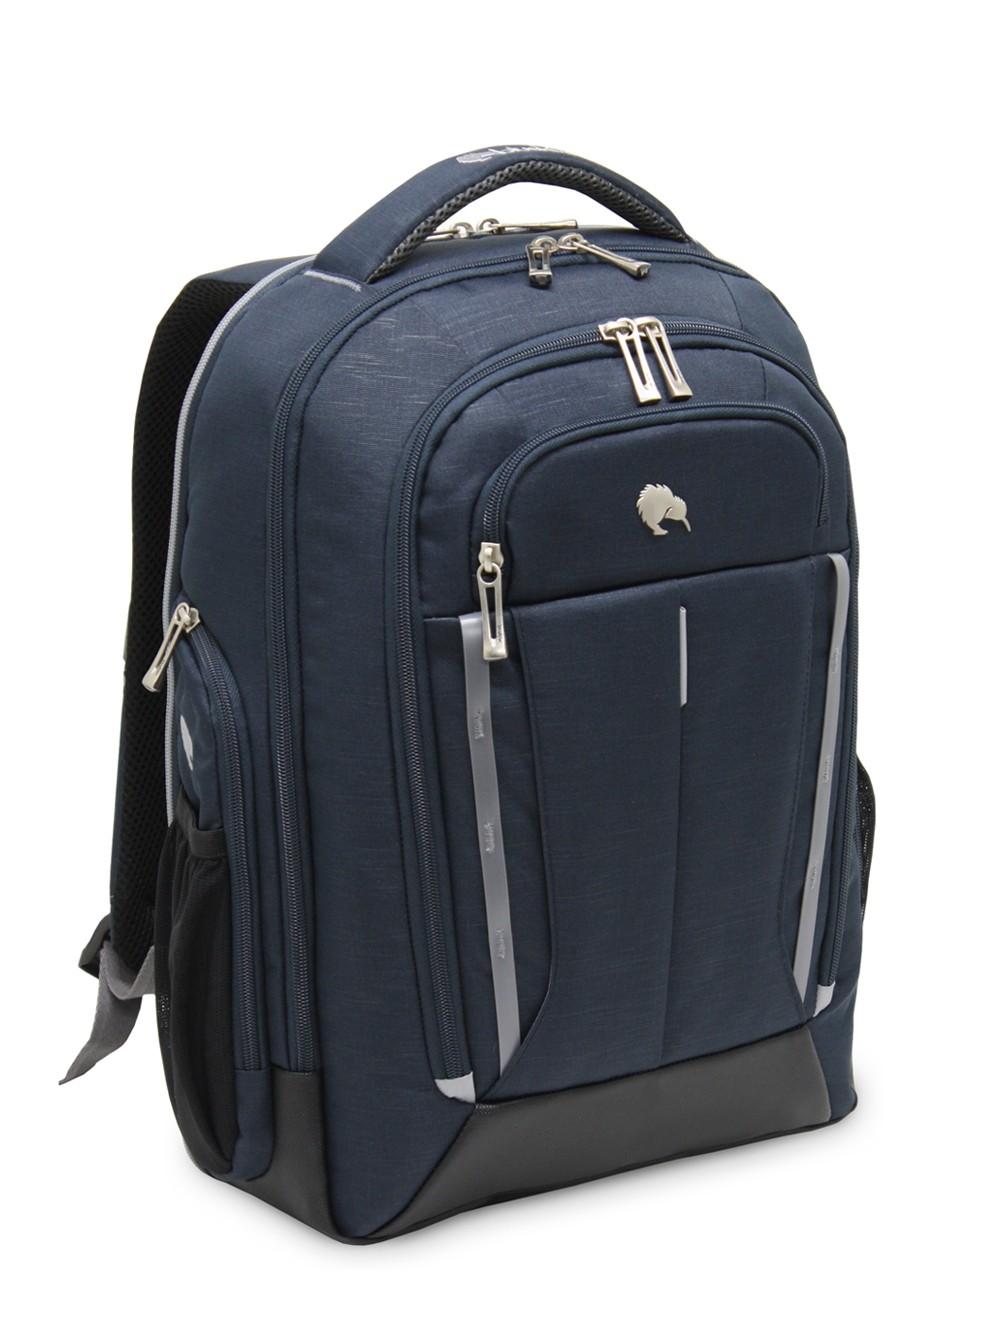 TIAKI Universal Diaper Backpack